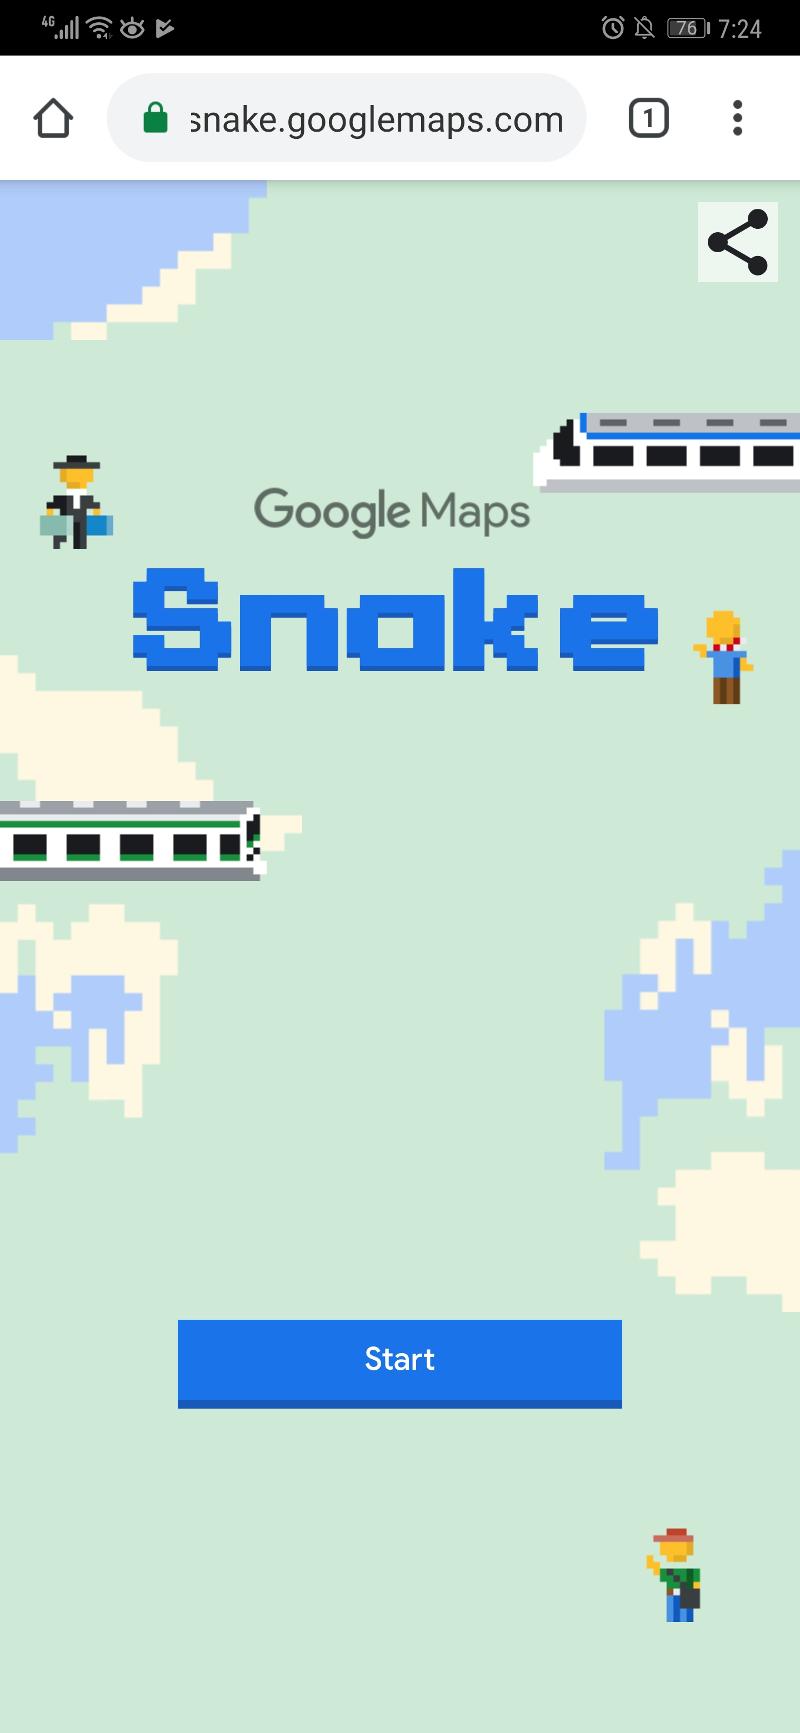 The splash screen in Google Maps Snake.